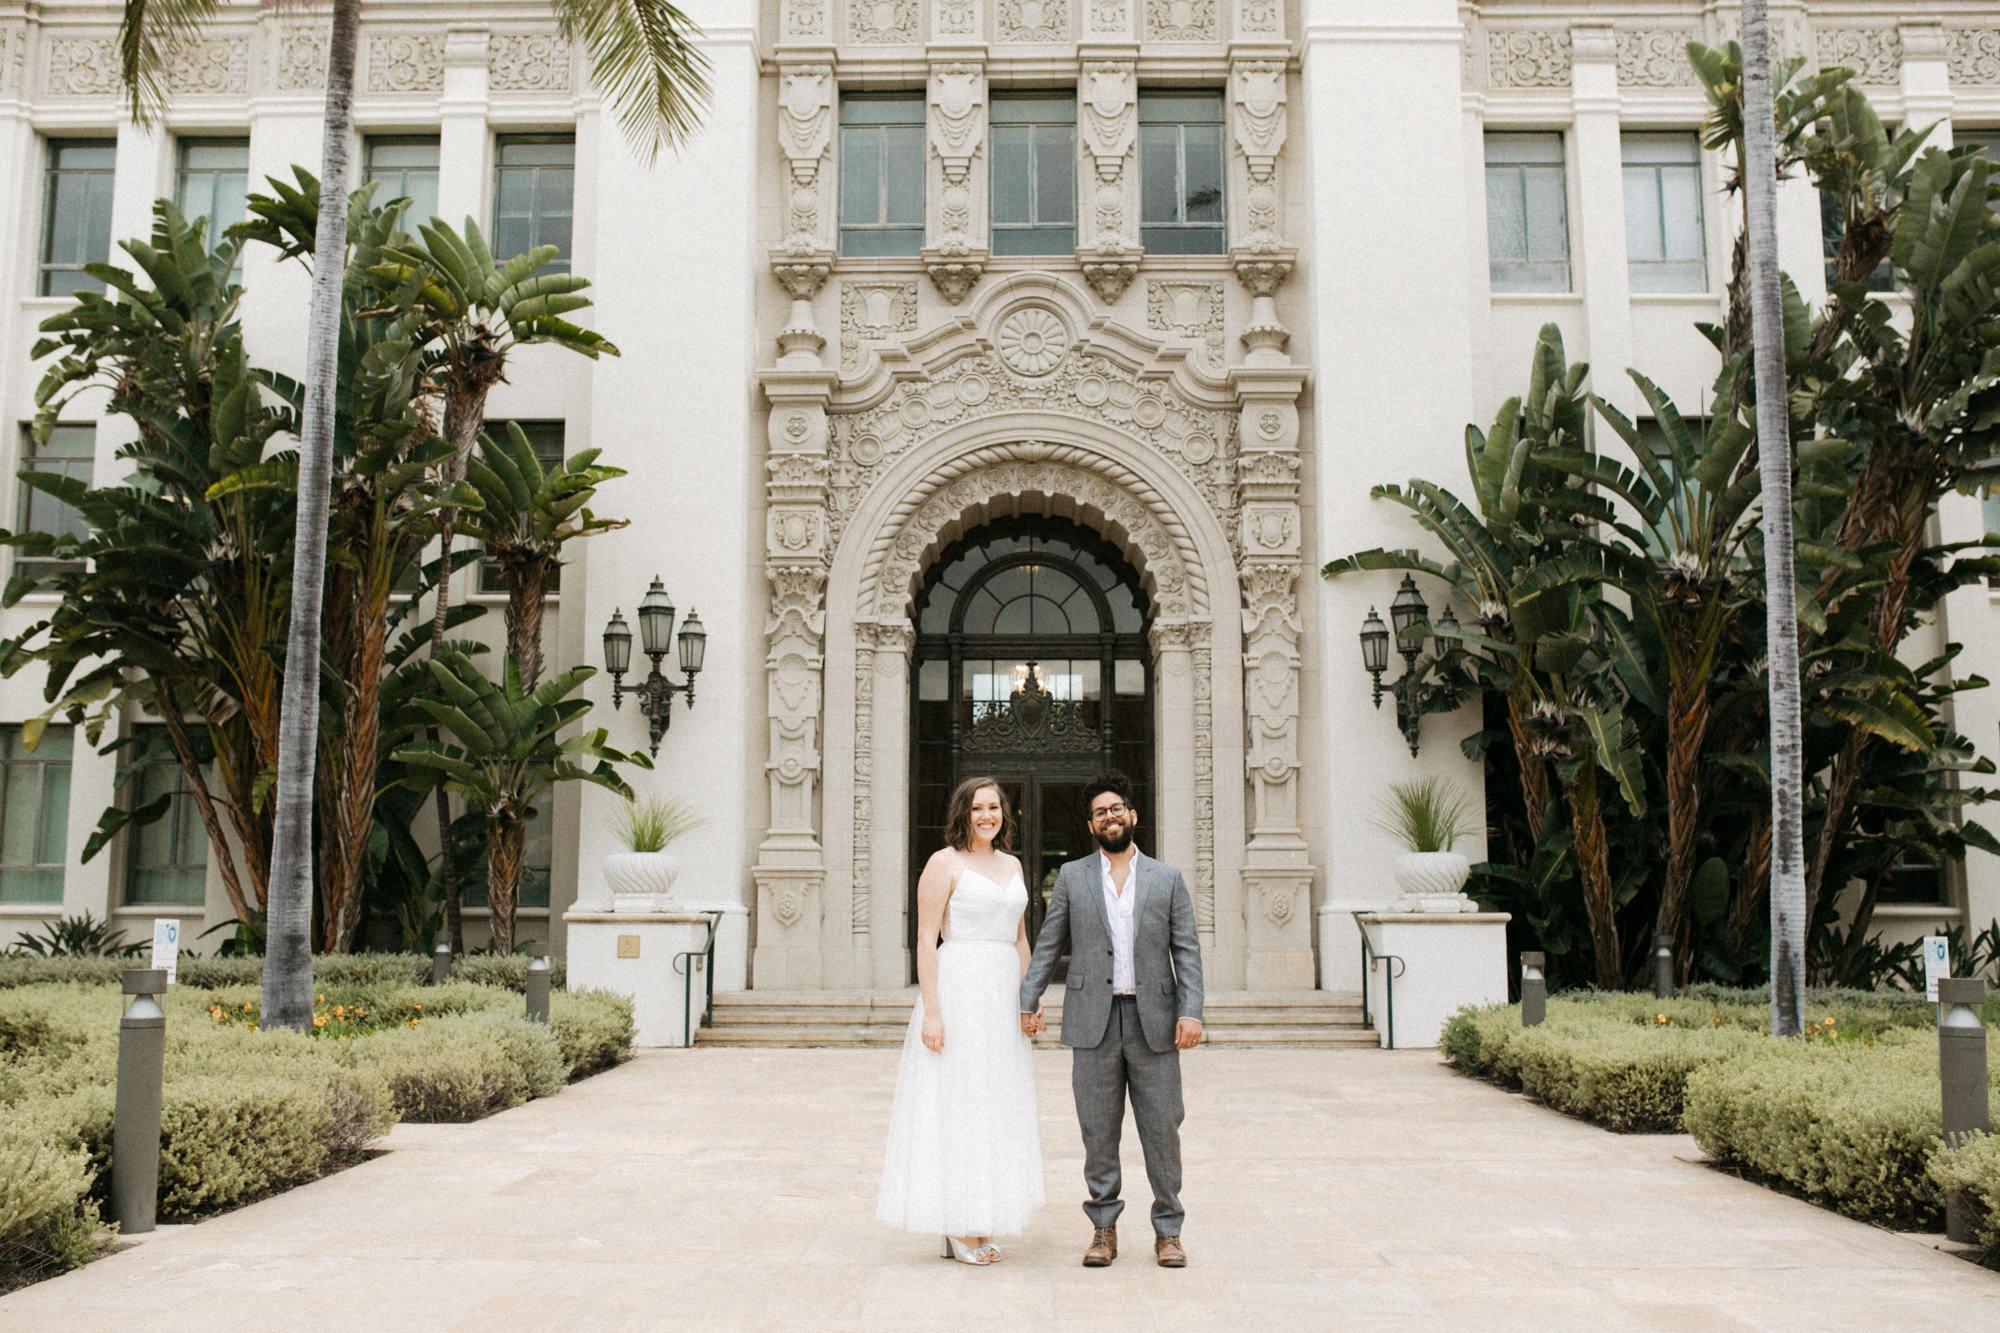 Beverly Hills Courthouse Wedding Photography Alexandra Ian Like Morning Sun Arizona And California Photography And Videography